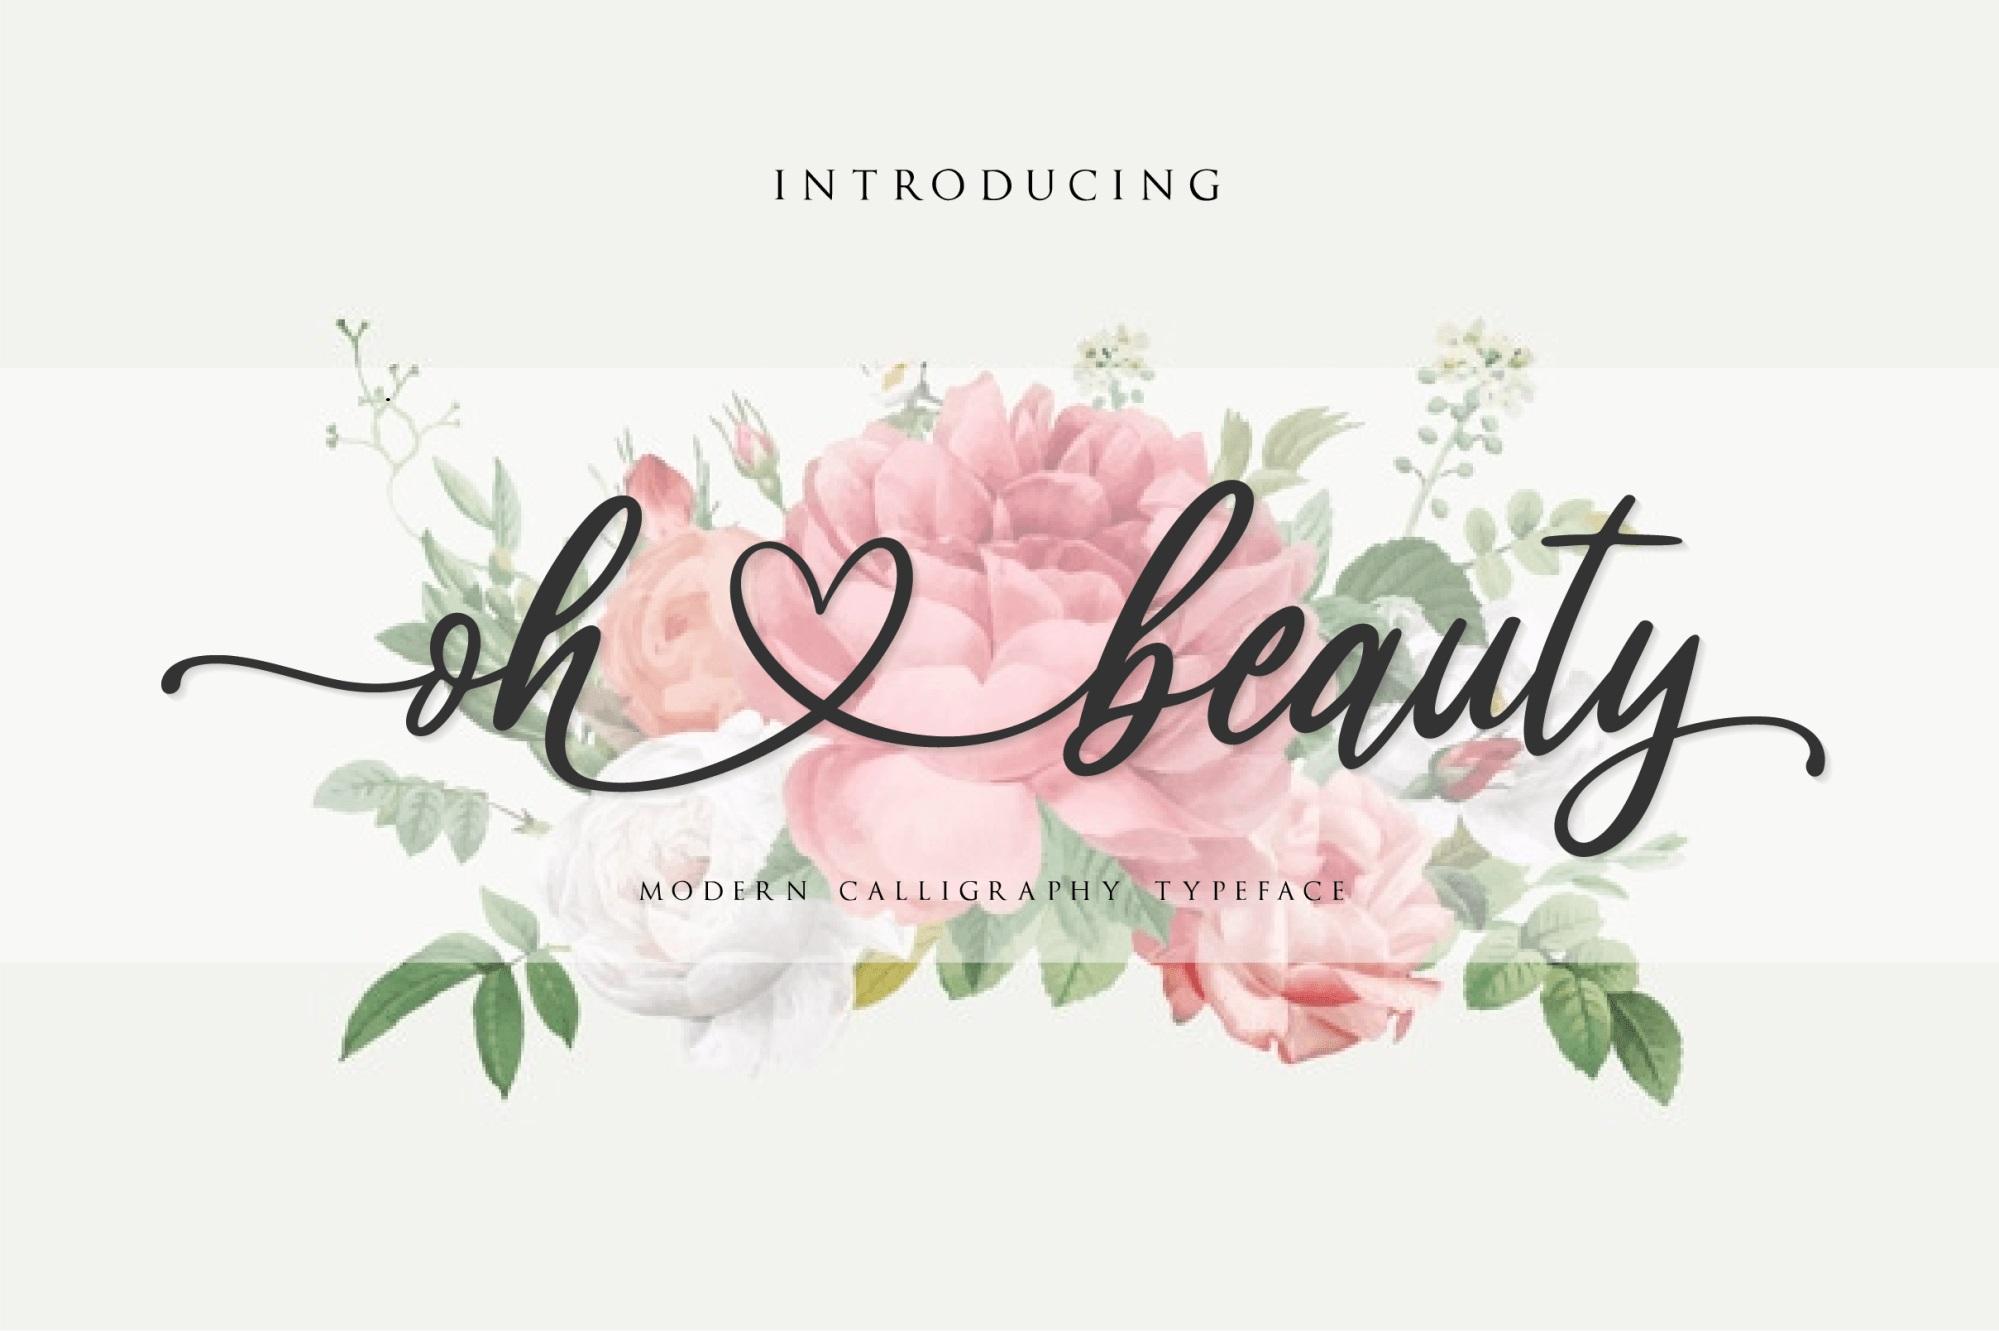 Oh-Beauty-Font